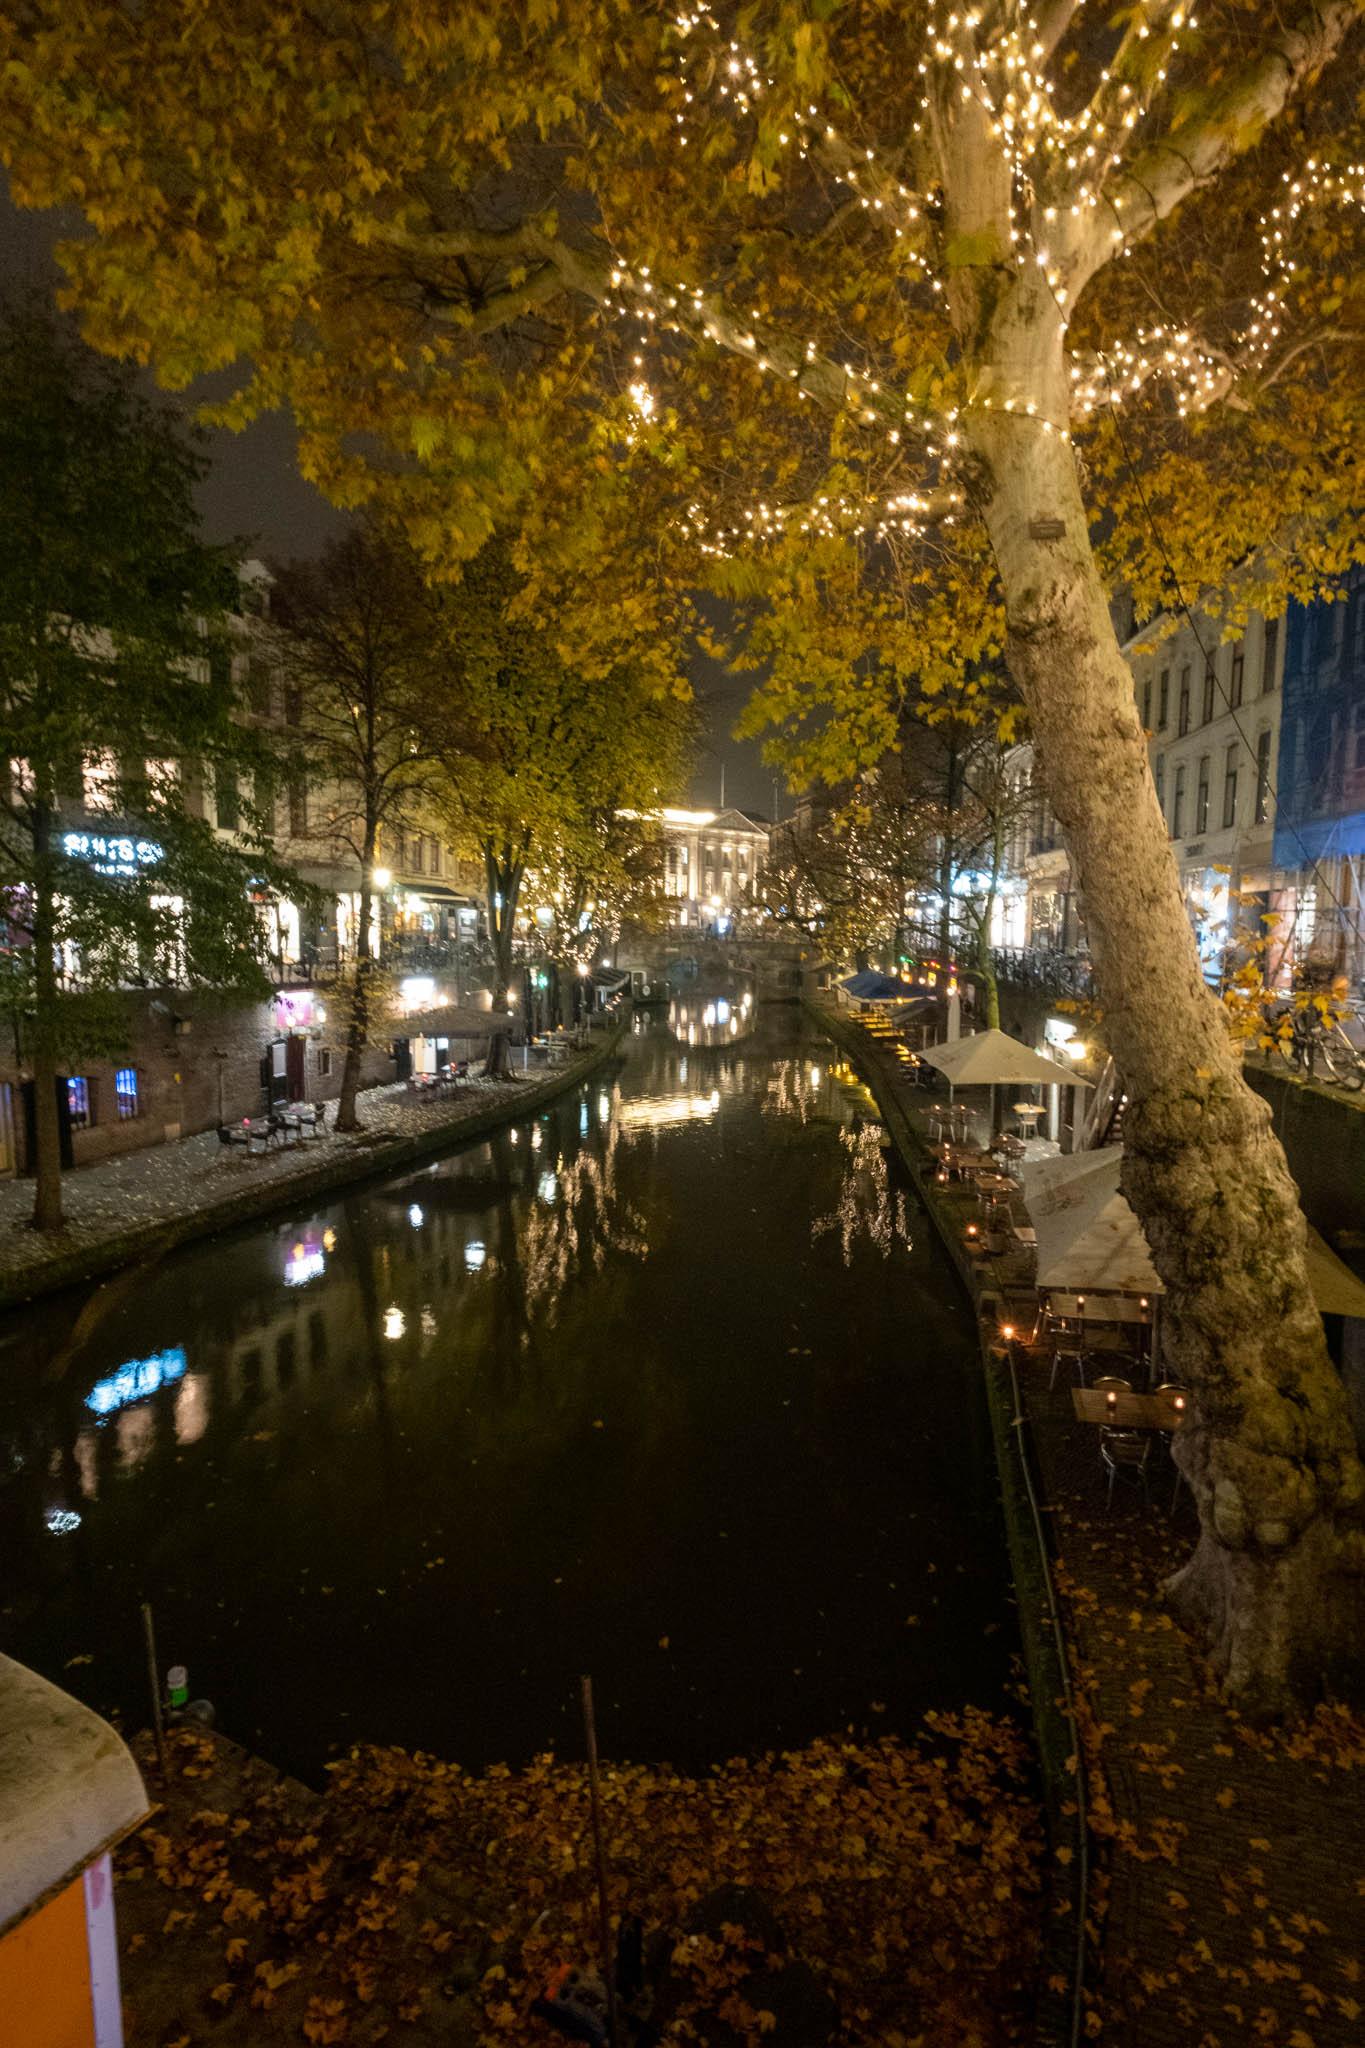 Utrecht Nov 2019